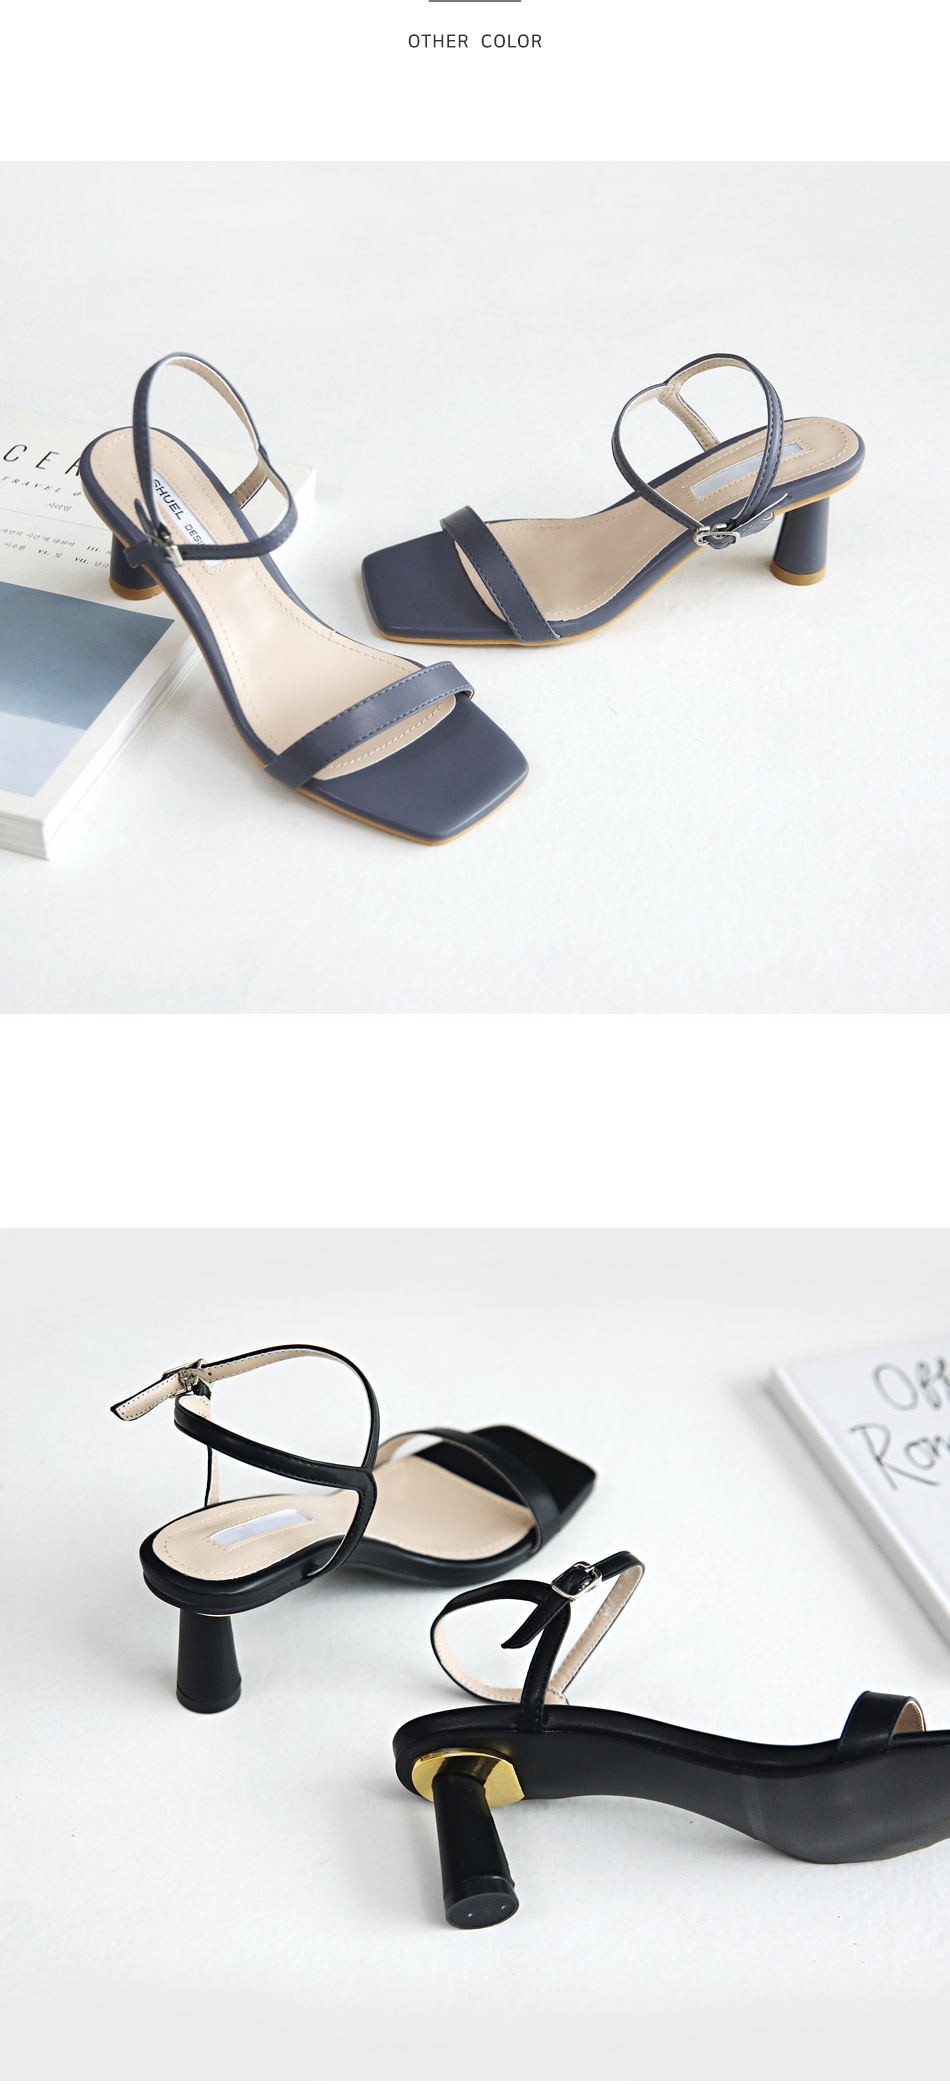 Celeb Slingback Sandals 6cm